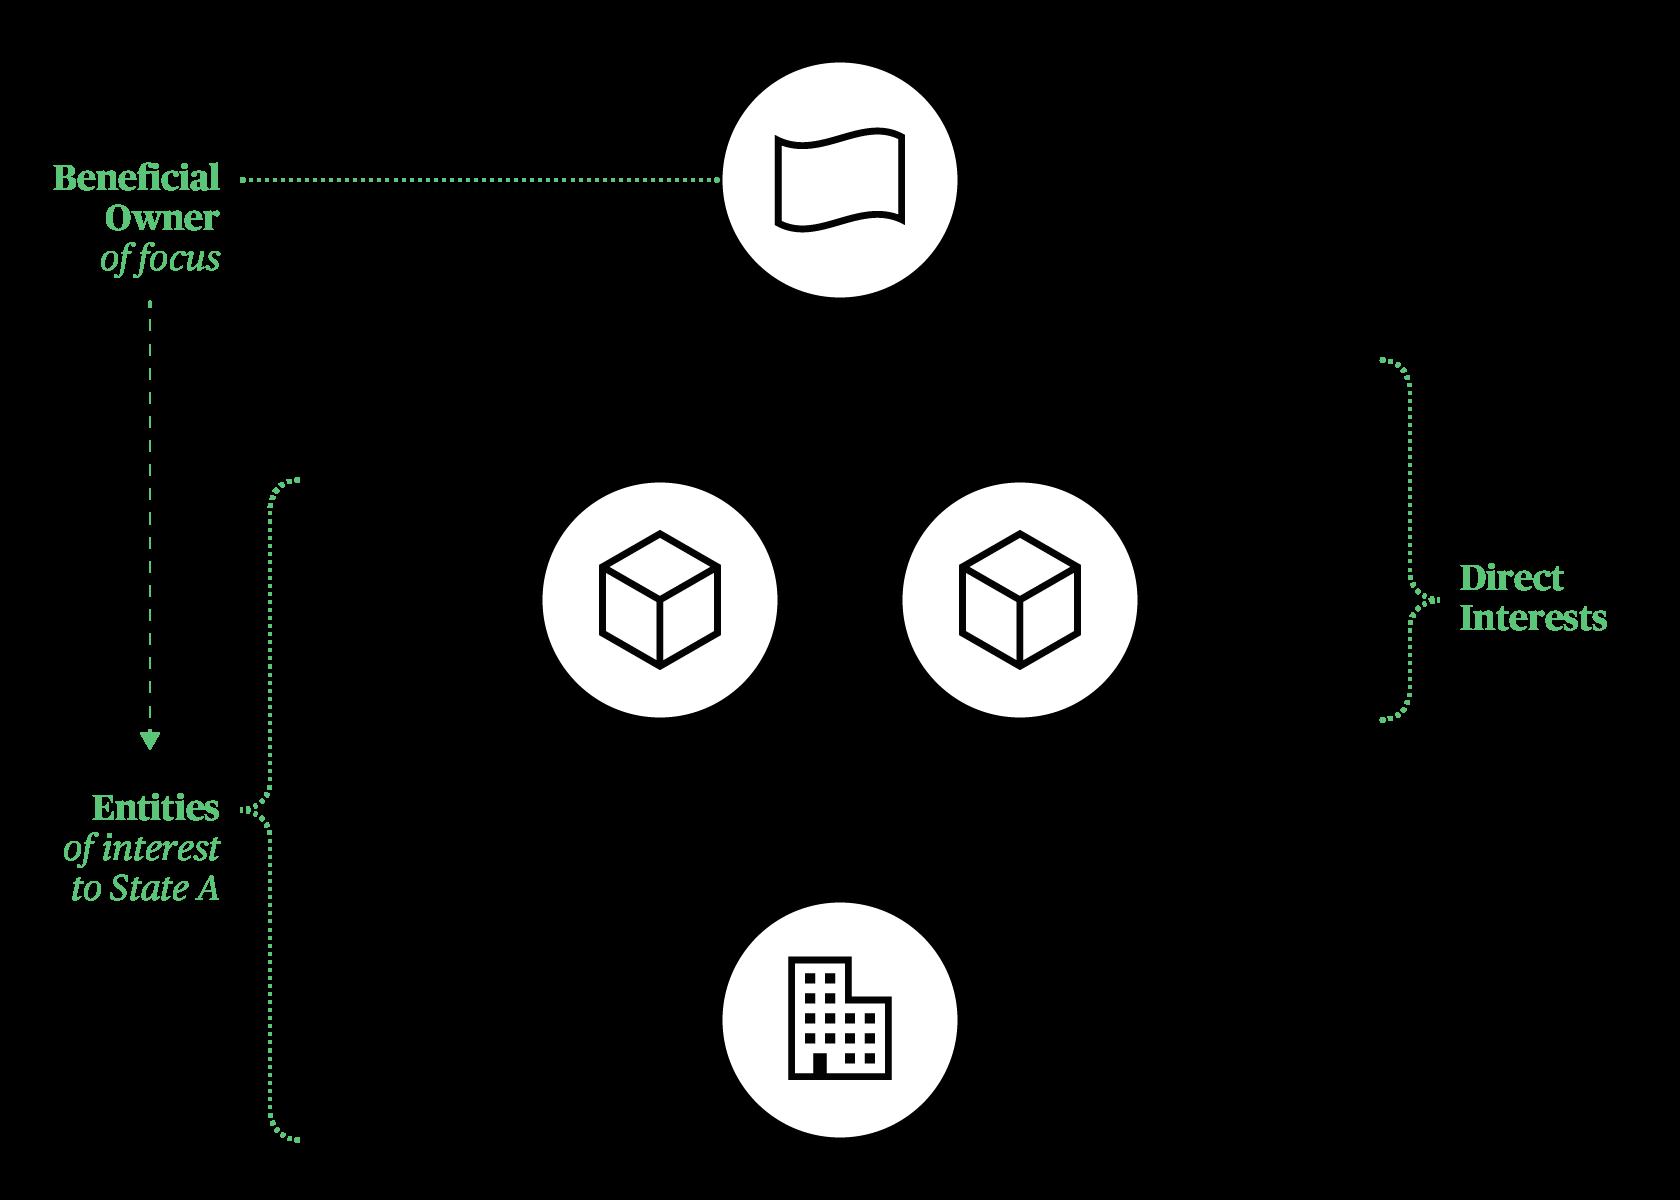 BOVS Diagram with Owner Focus